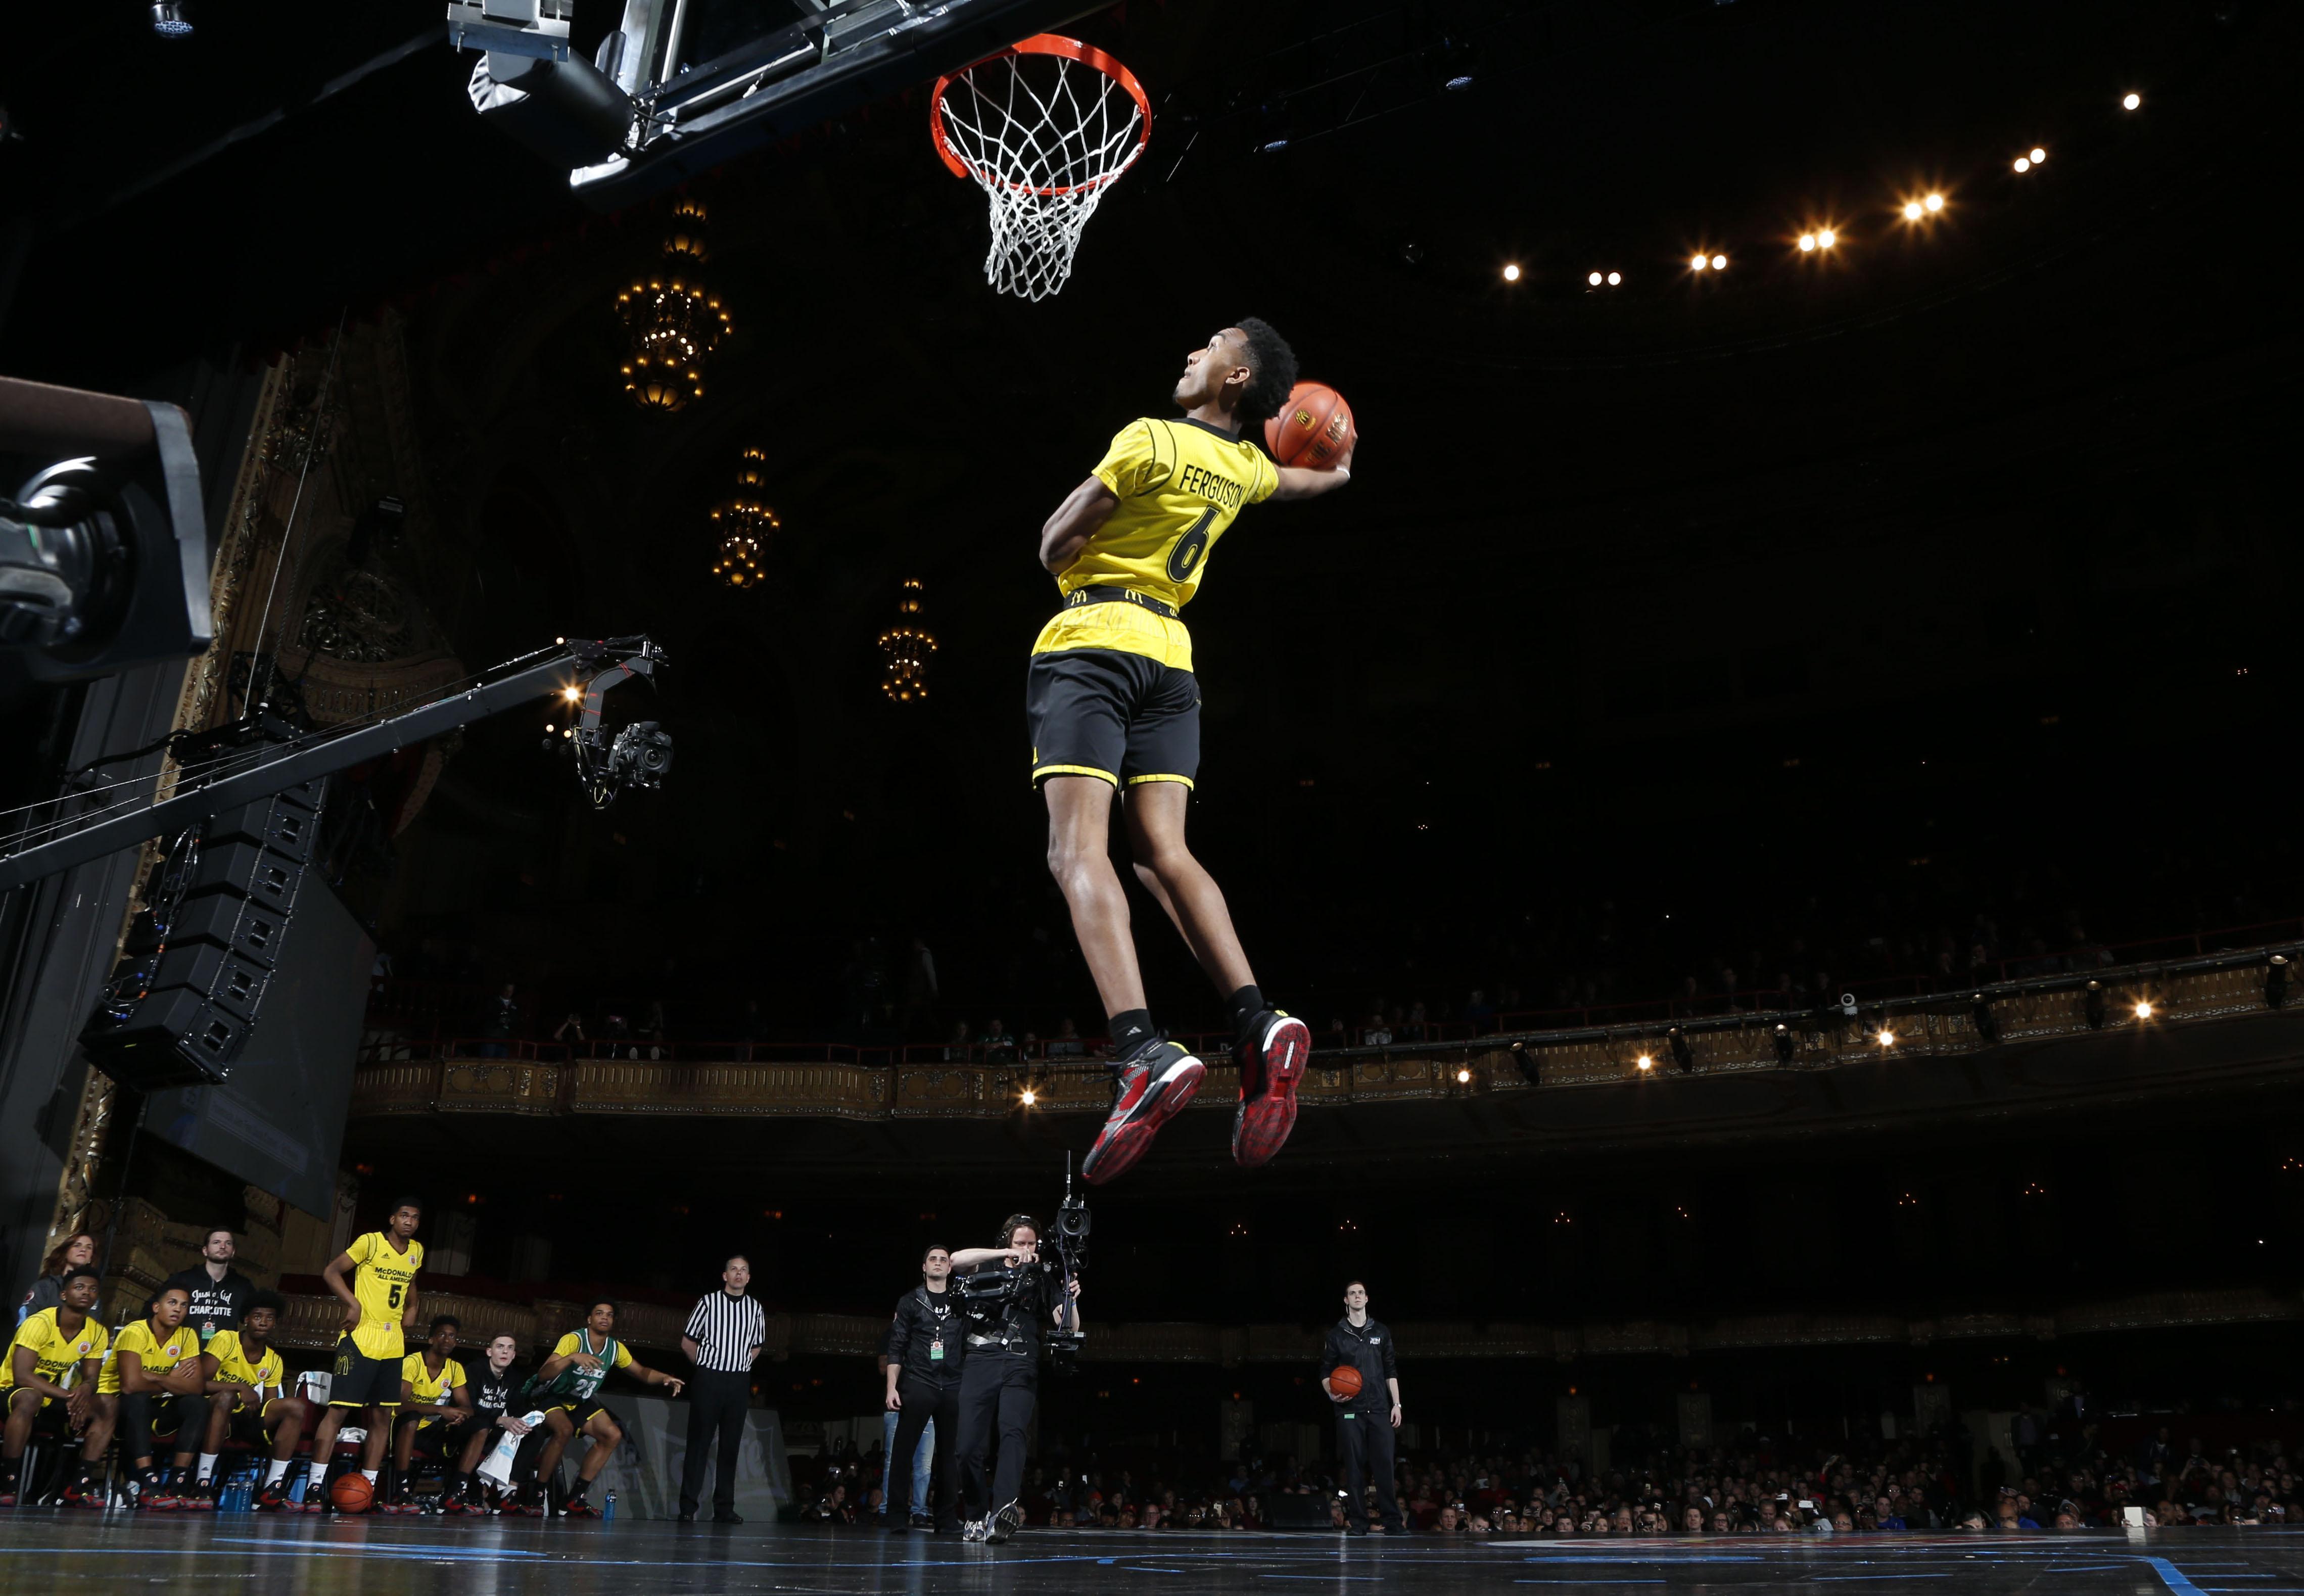 9216608-high-school-basketball-mcdonalds-all-american-jamfest